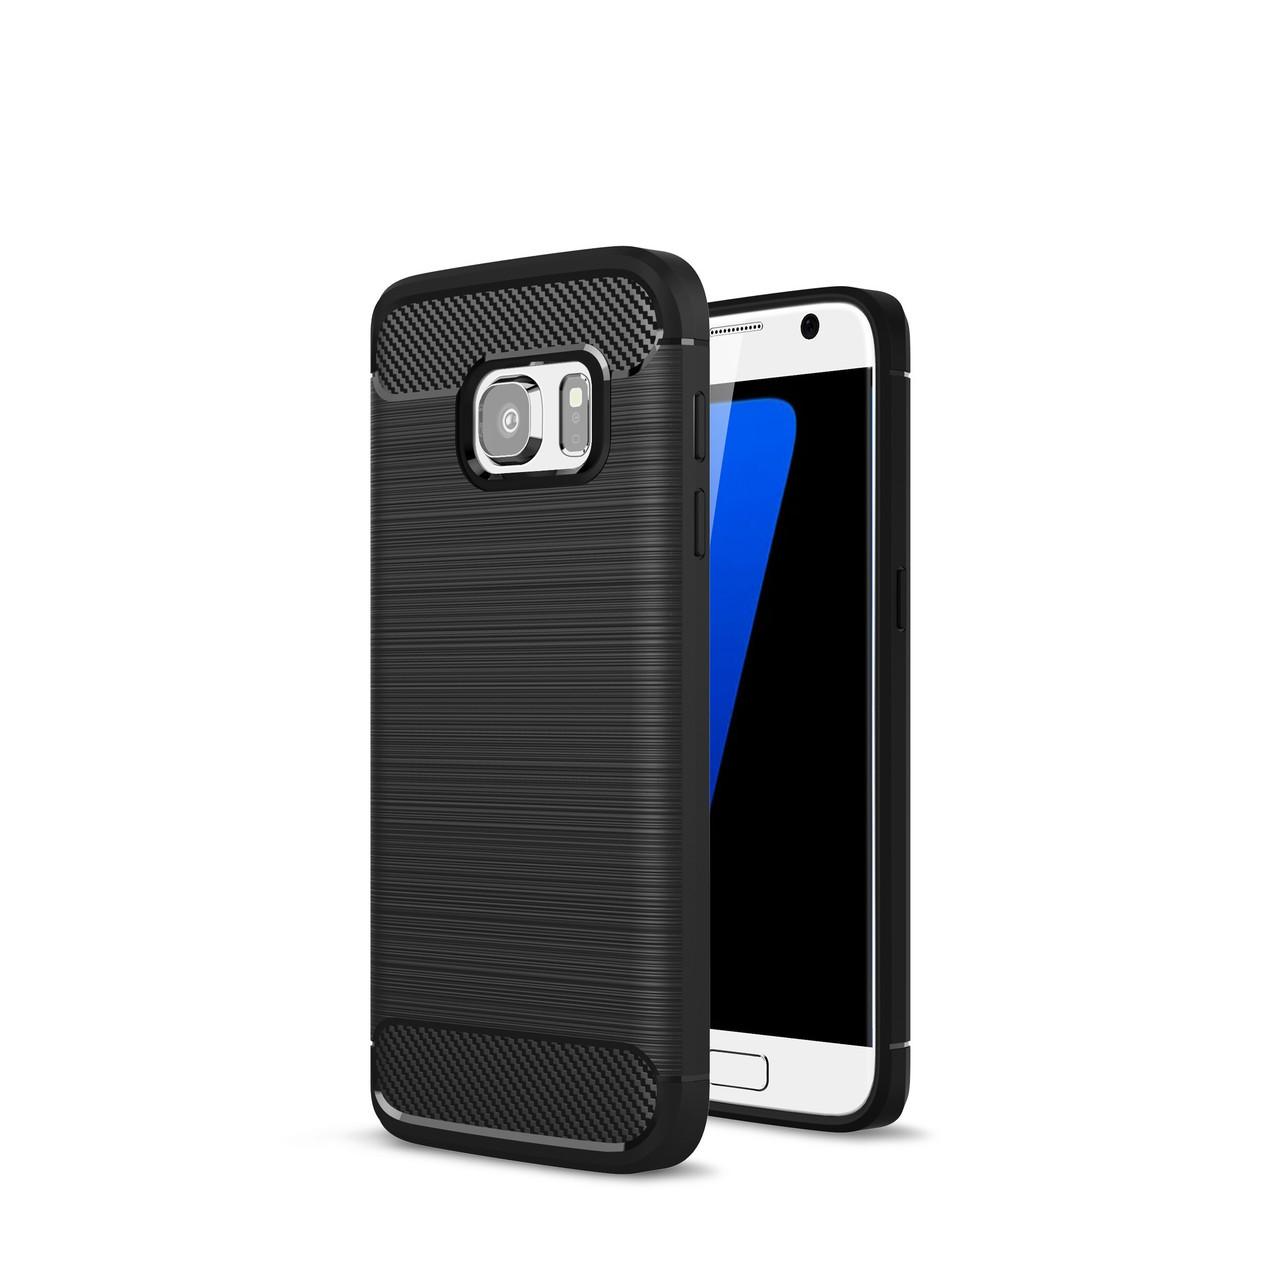 Чехол для Samung Galaxy S7 Carbon